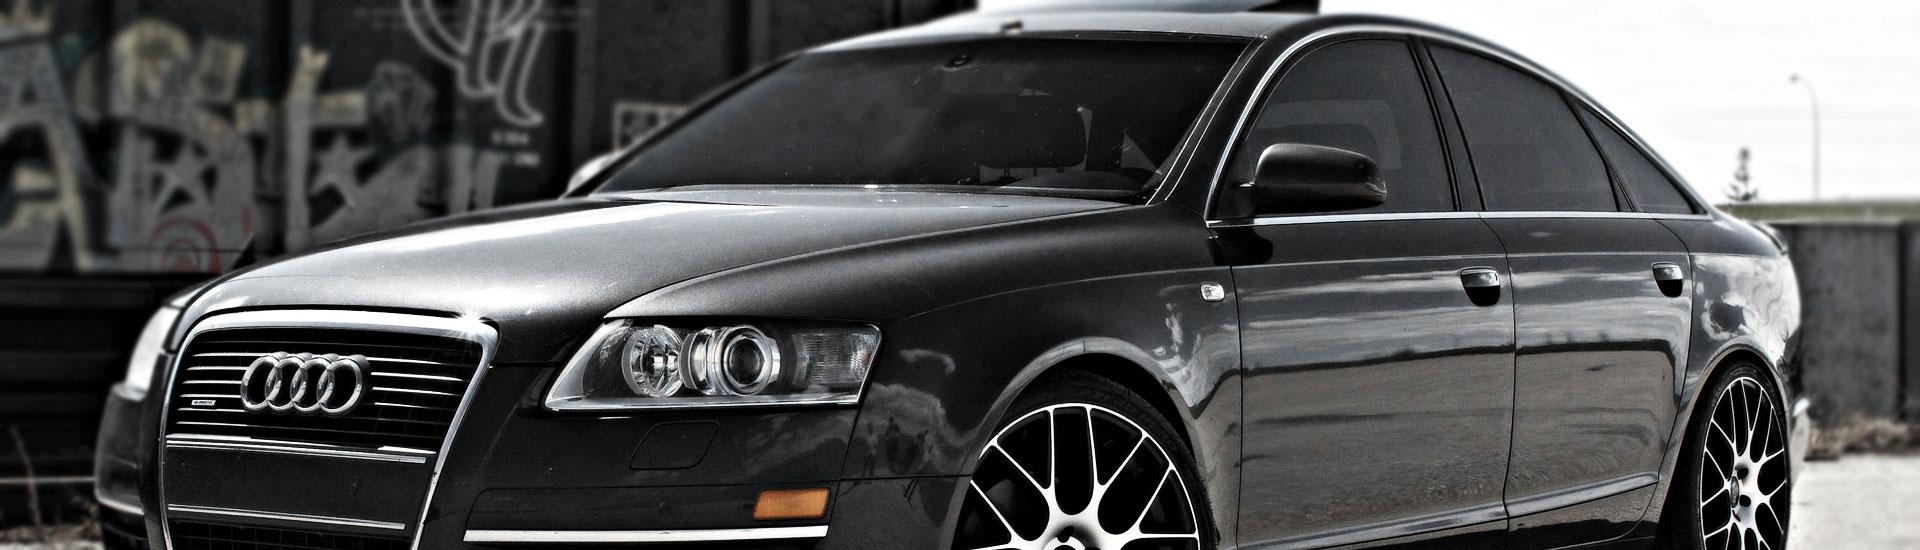 Audi A6 Window Tint Kit | DIY Precut Audi A6 Window Tint Black Tinted Audi A on honda accord tinted, audi s5 tinted, audi a3 tinted, nissan altima tinted, jeep grand cherokee tinted, audi a4 avant tinted,